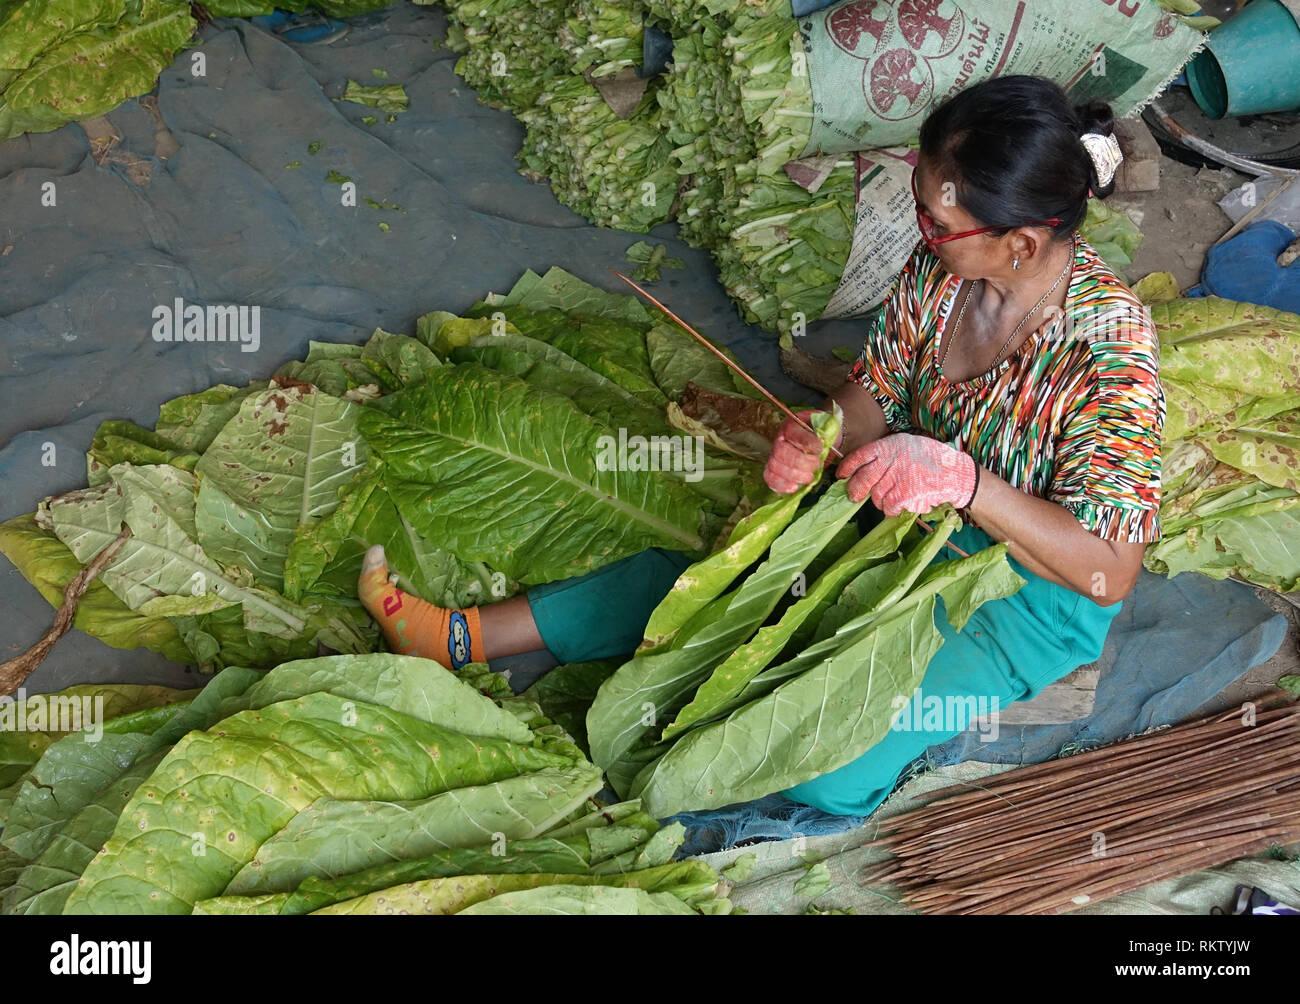 Thailand Companies Stock Photos & Thailand Companies Stock Images